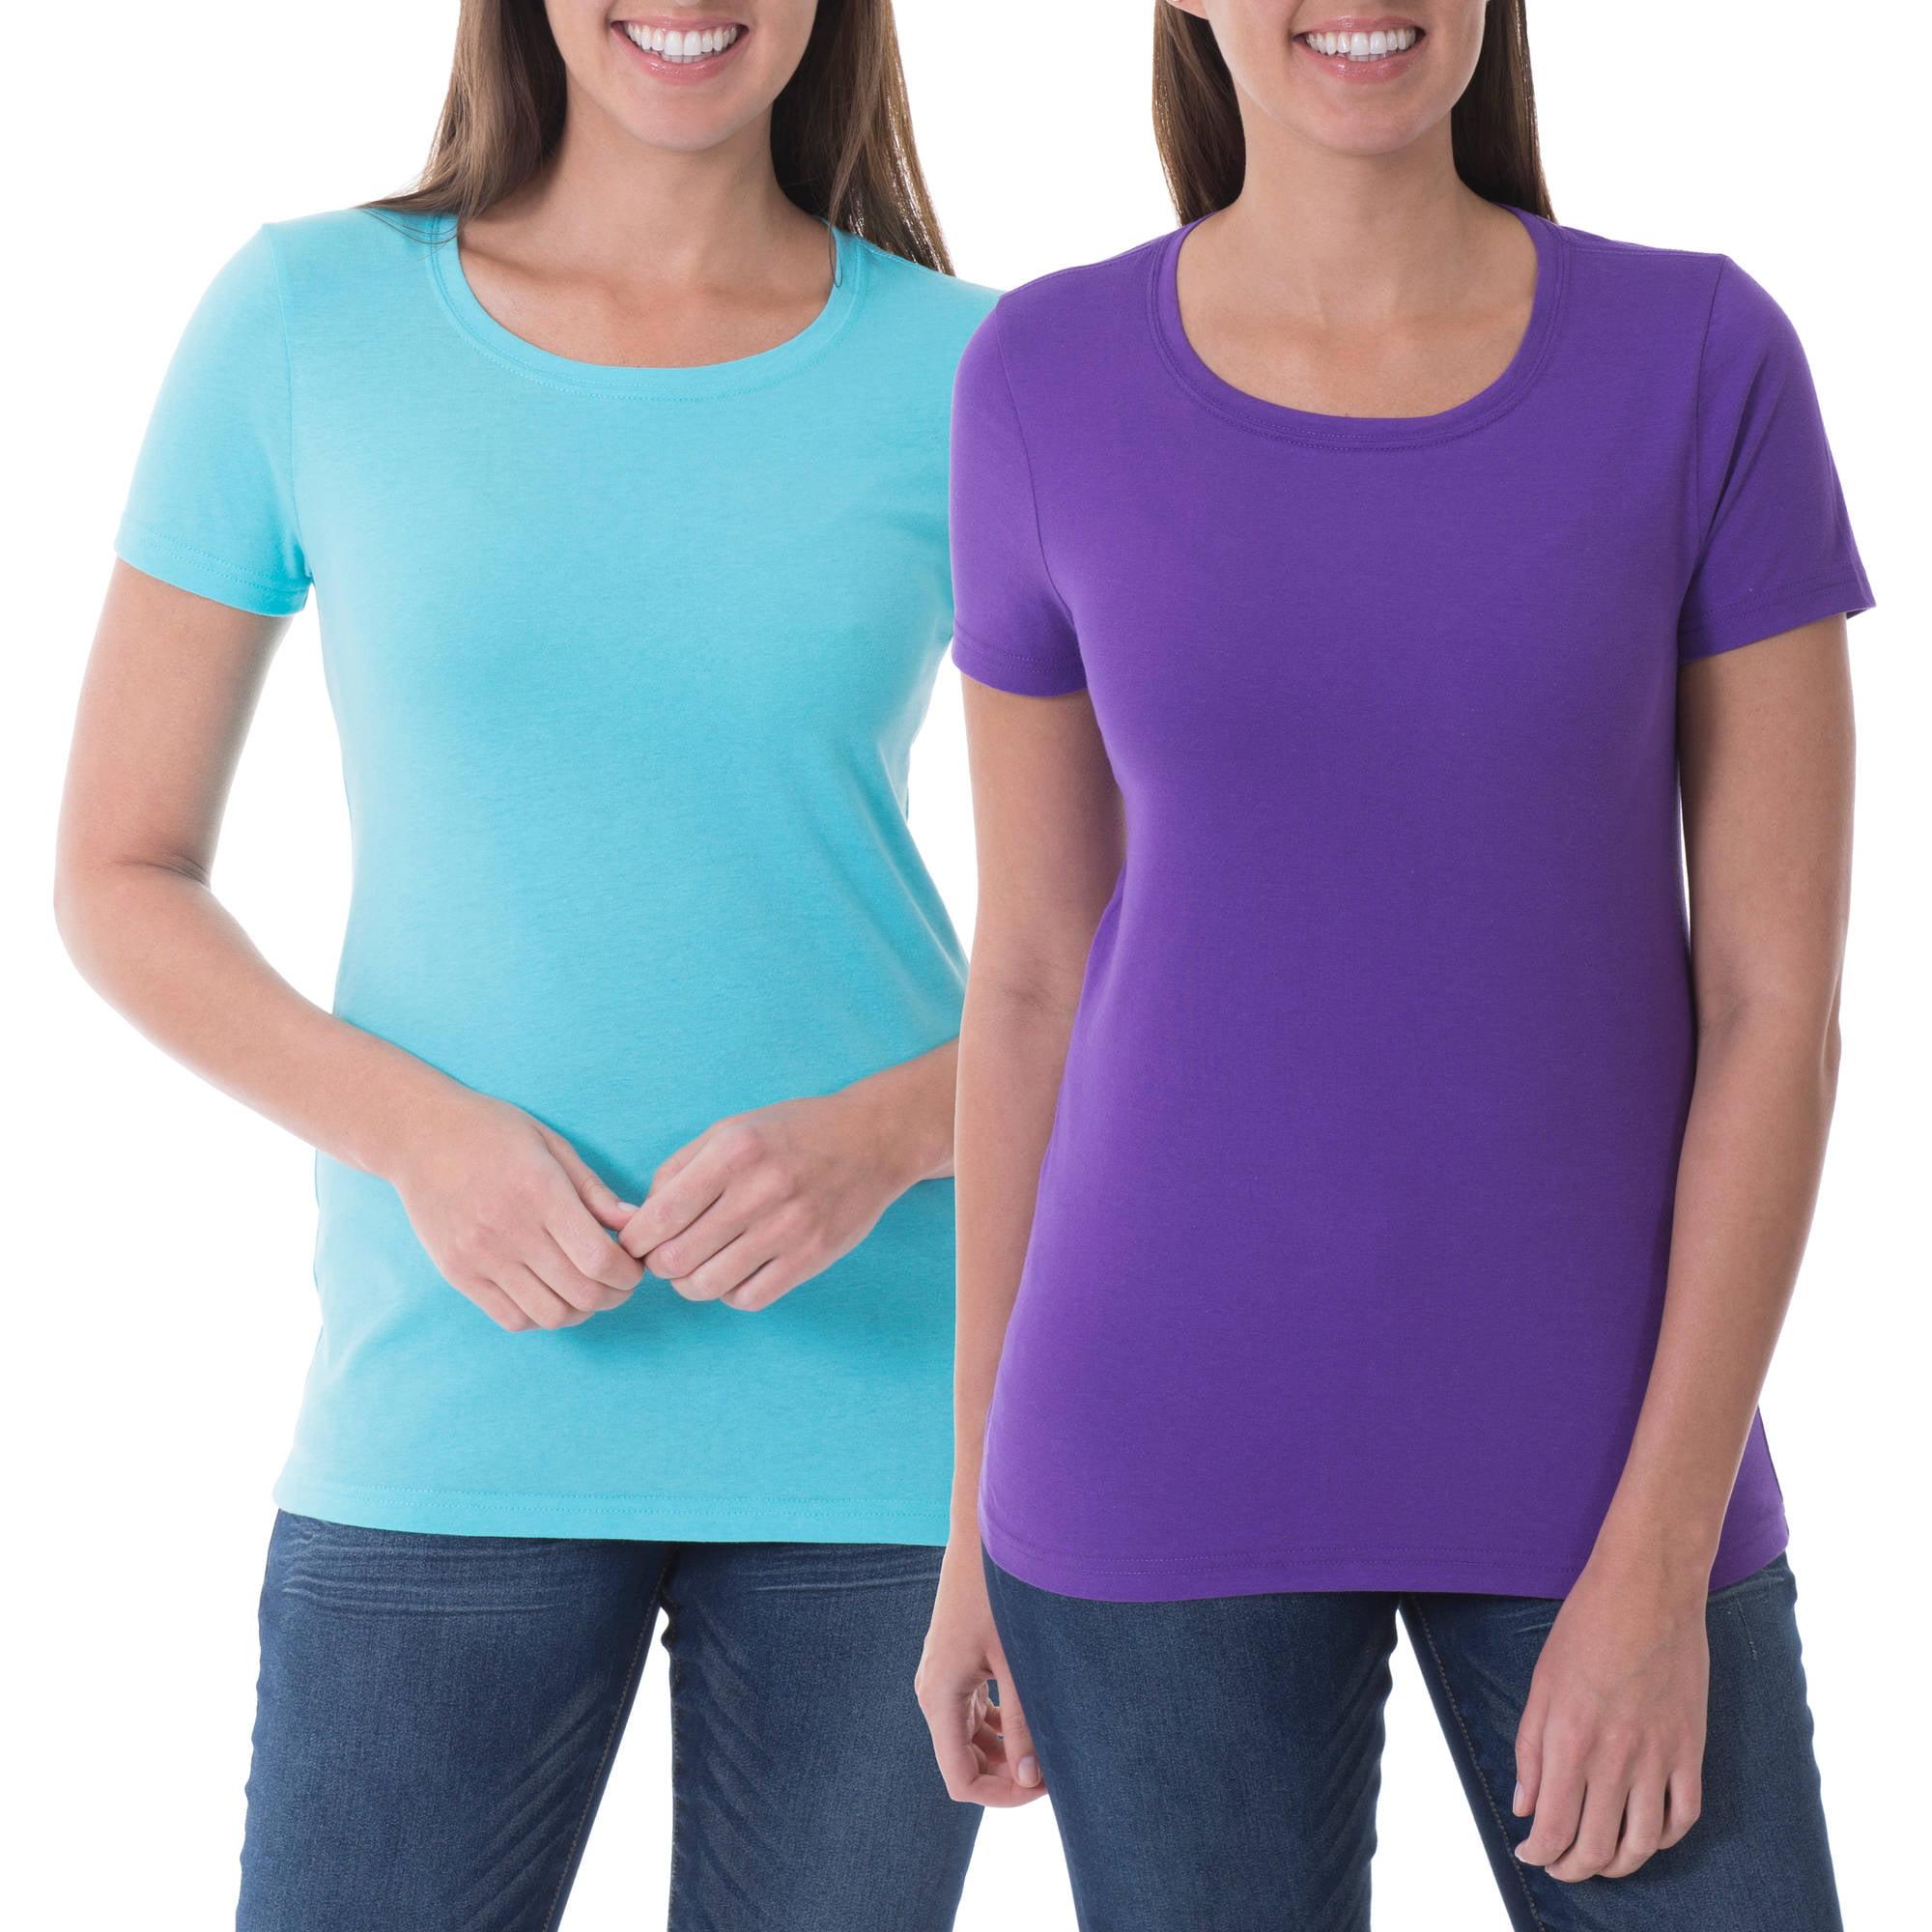 Faded Glory Women's Short Sleeve Crew Neck T-Shirt. 2 Pack Value Combo